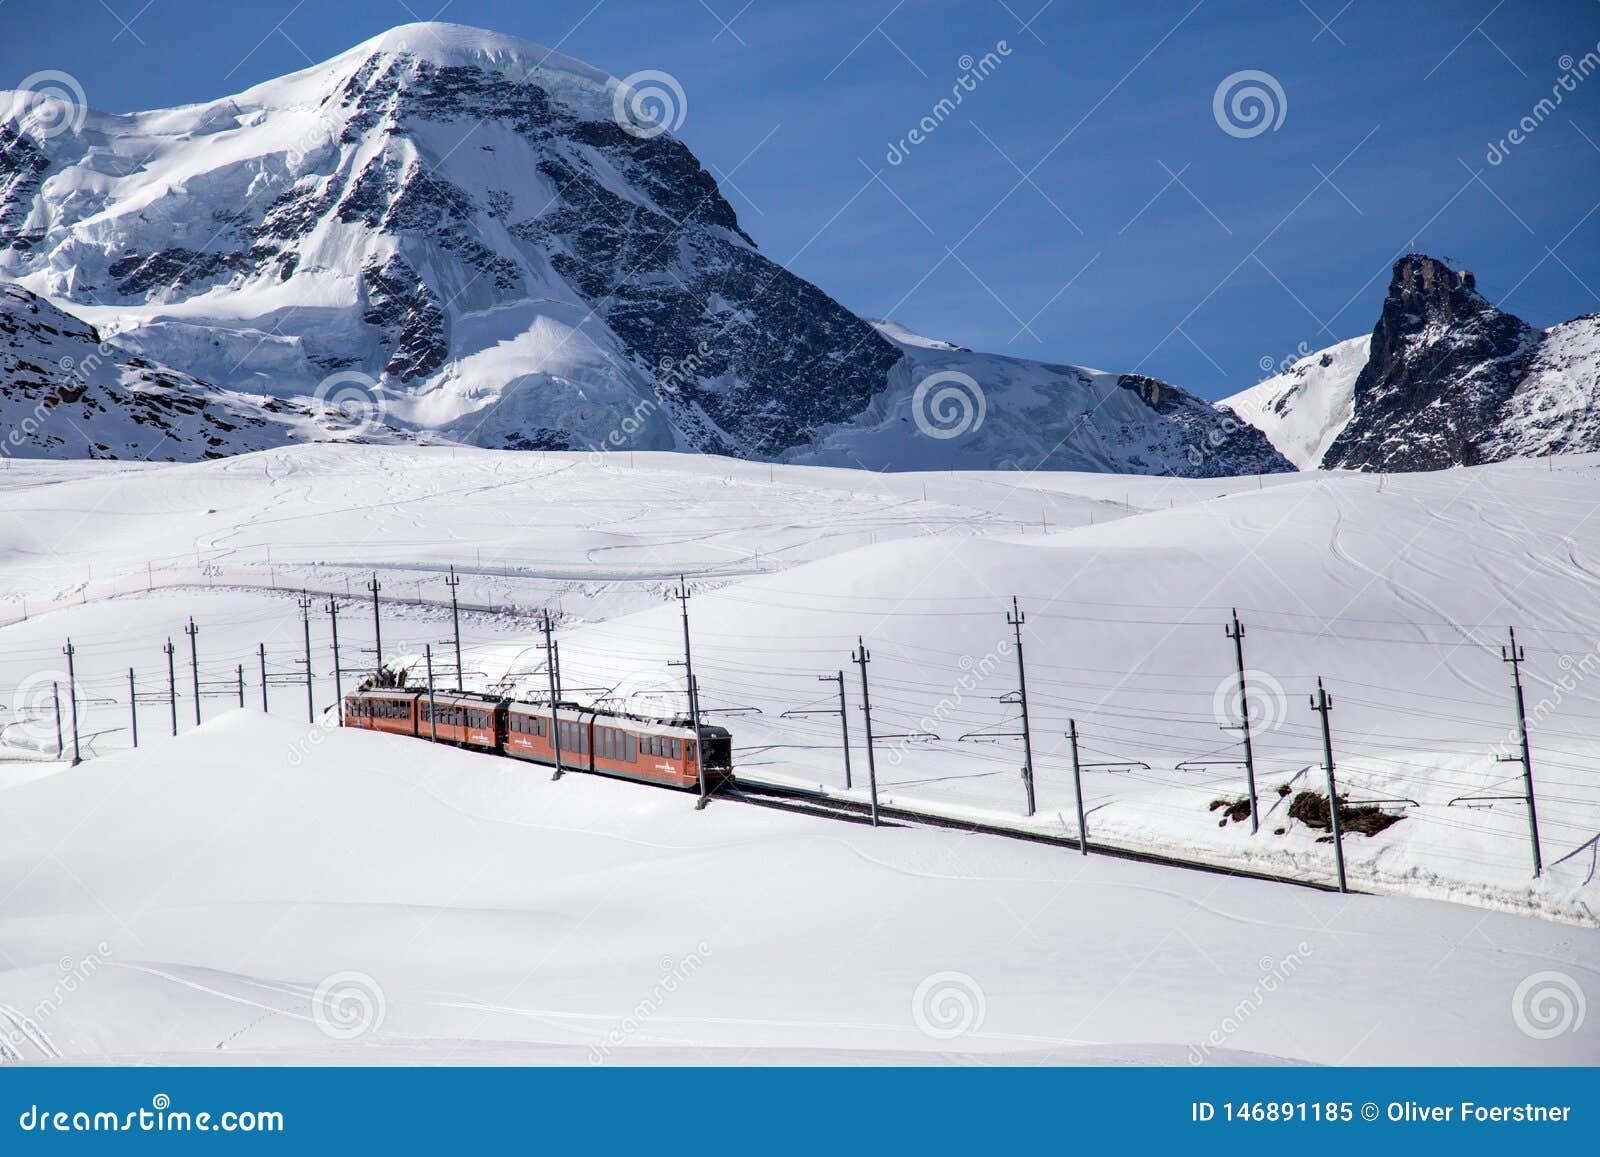 Gornergrat Train in Matterhorn Skiing Area